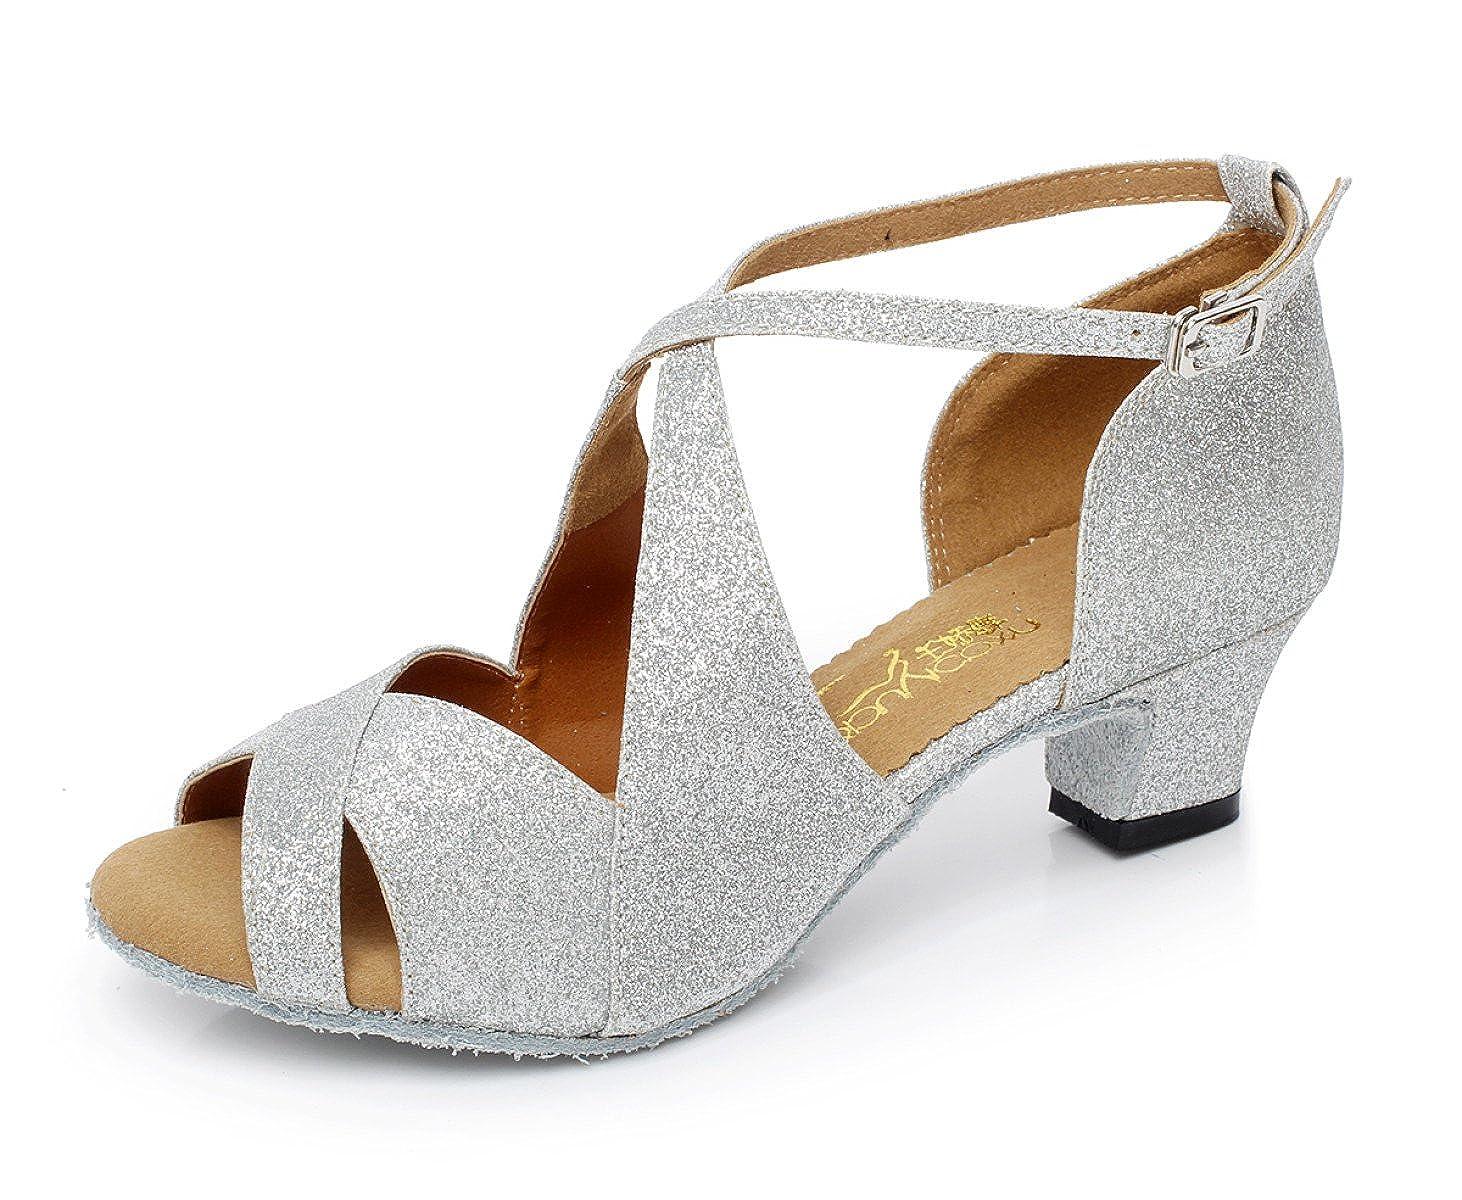 JSHOE Damen Tanzschuhe Latin Salsa/Tango/Tee/Samba/Modern/Jazz Schuhe Sandalen High HeelsSilver-heeled5cm-UK7...